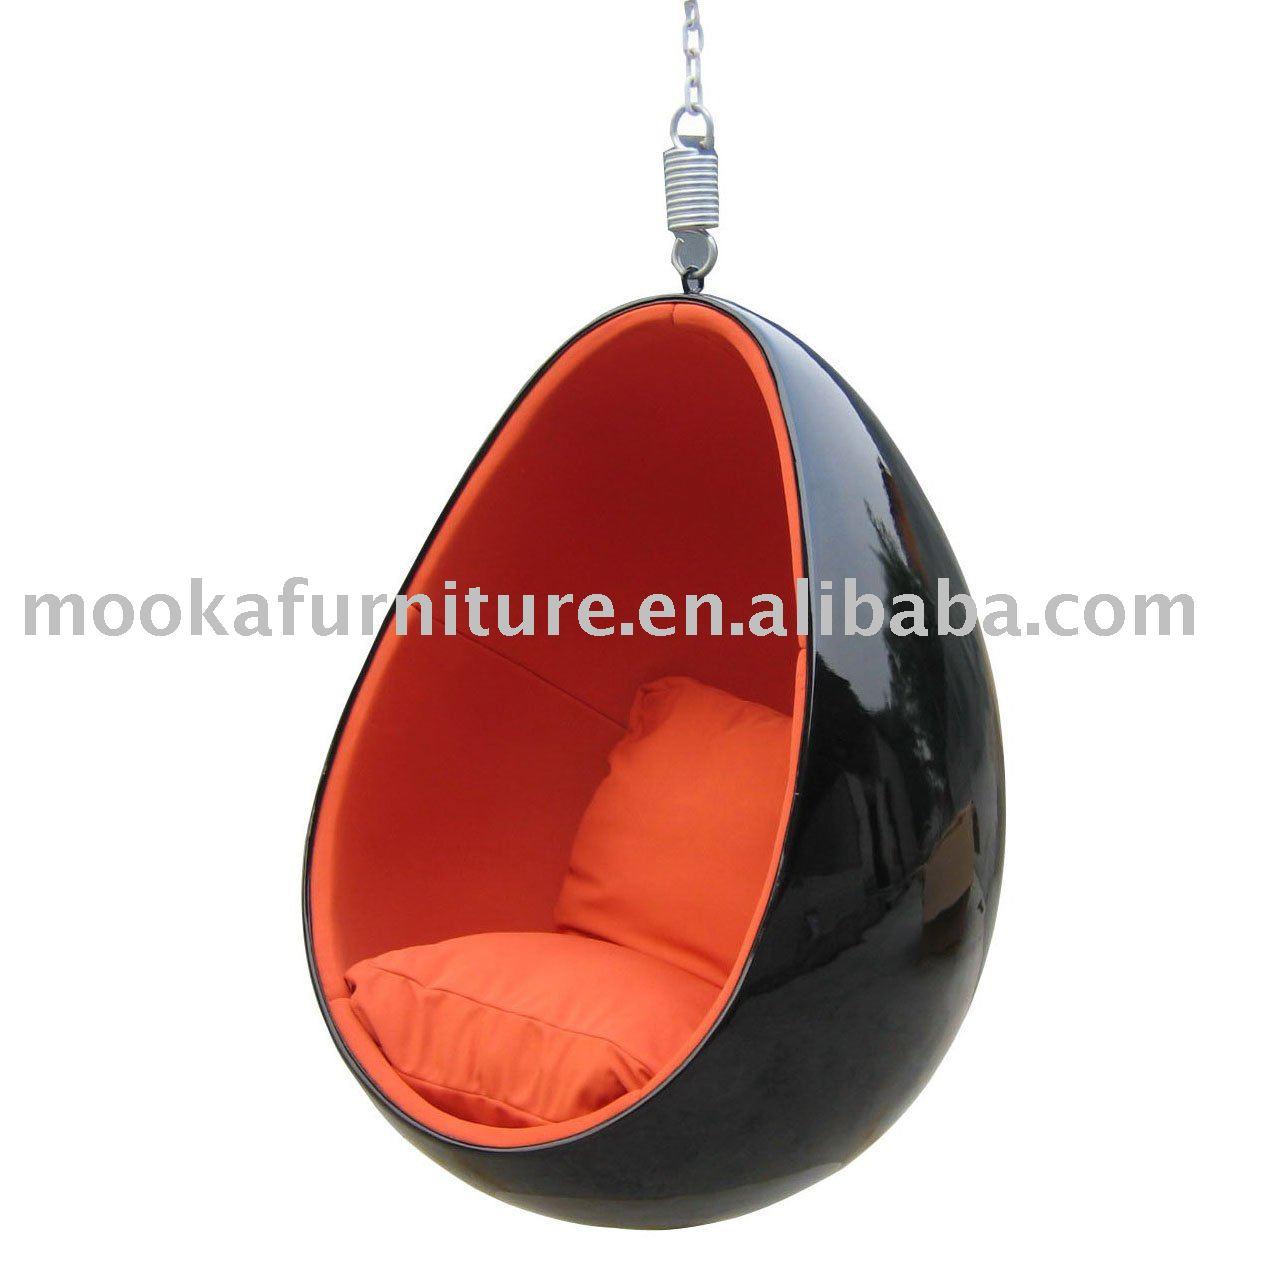 Egg Hanging Seats Home Decor And Interior Design